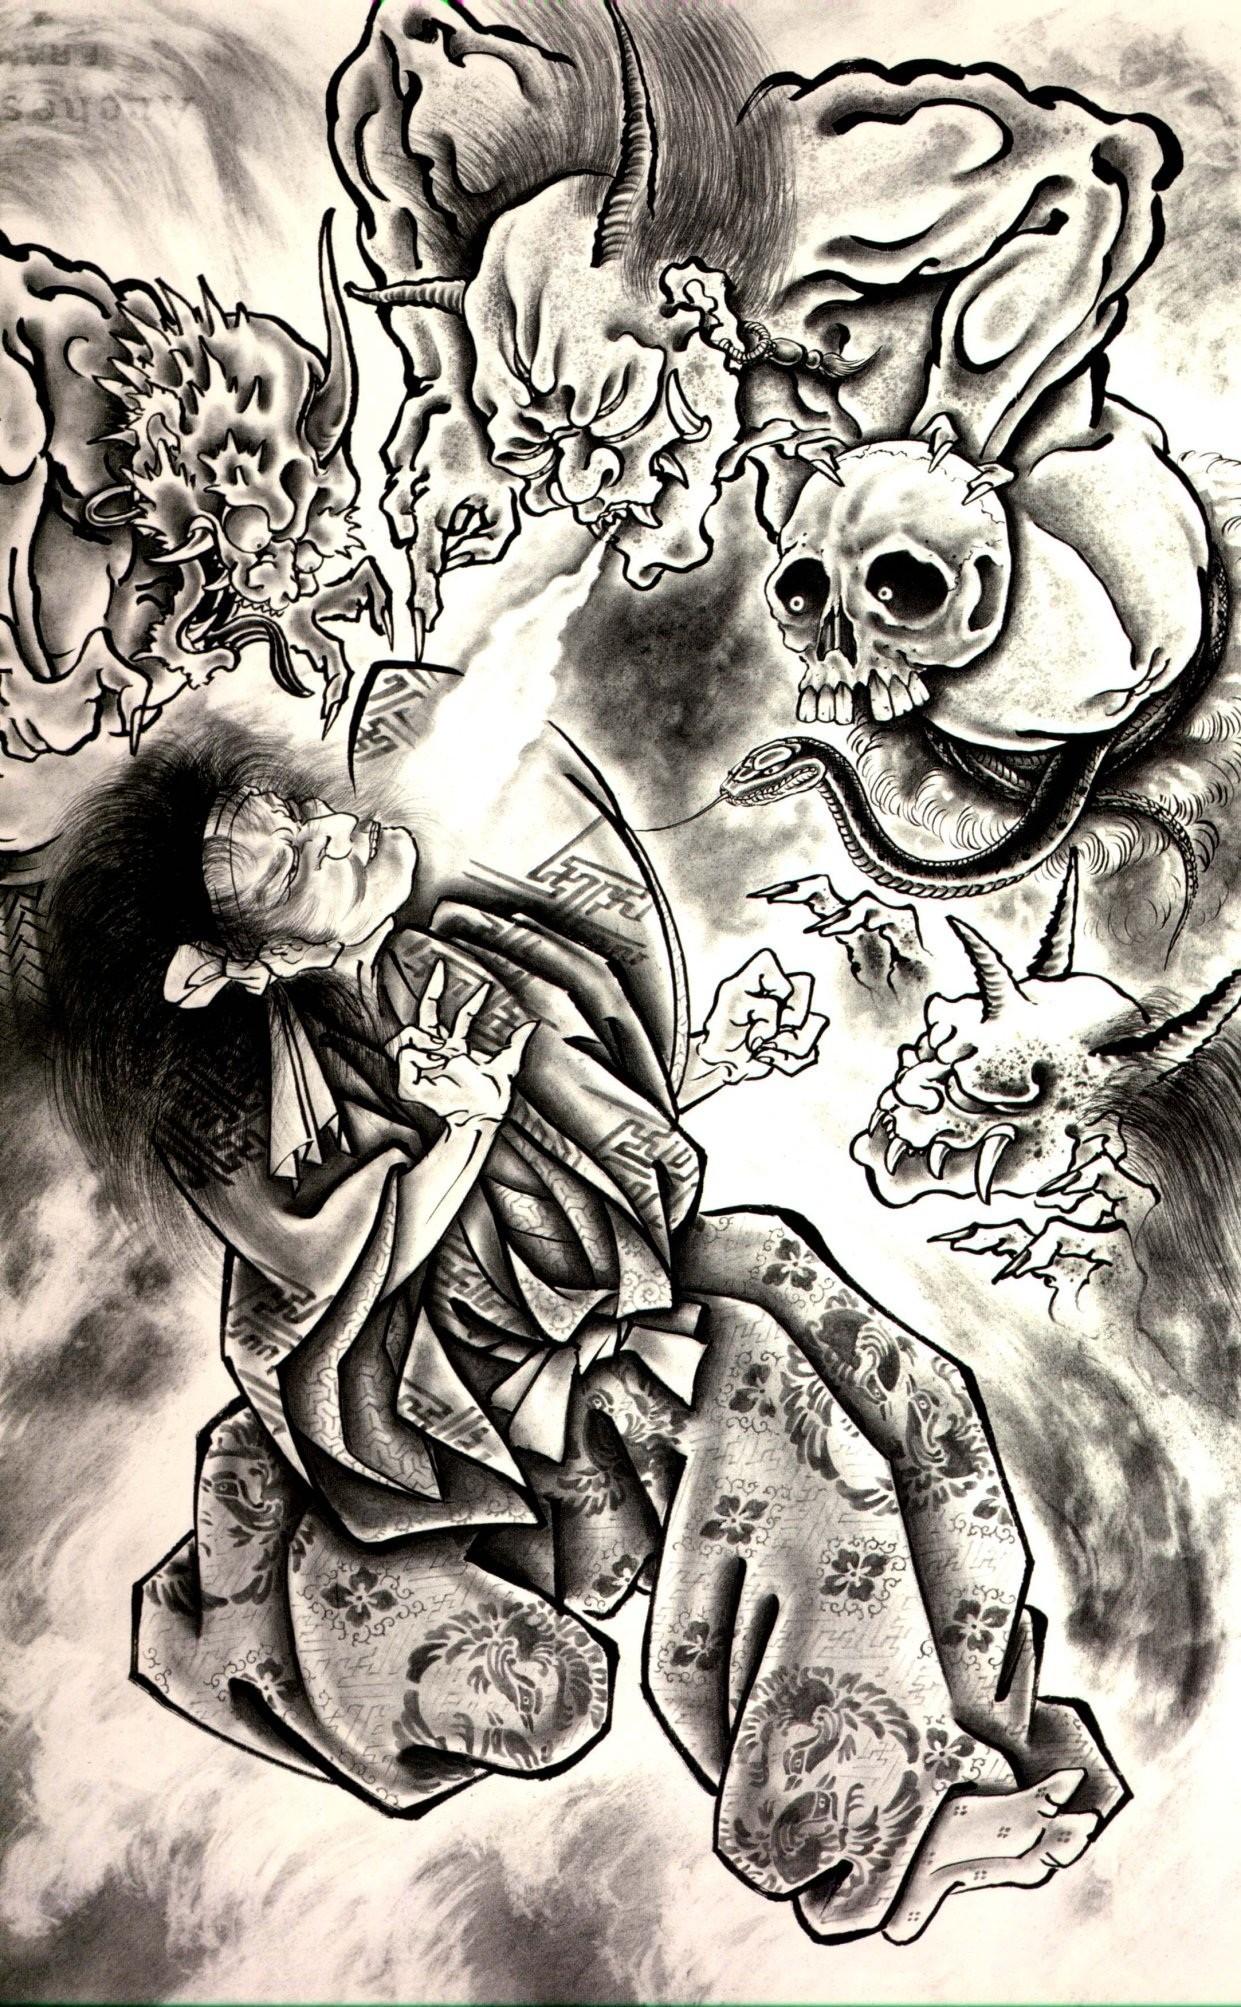 Res: 1241x2007, Demon Tattoo Wallpaper with regard to da vincis demons da vincis demons  wallpaper 34231715 fanpop